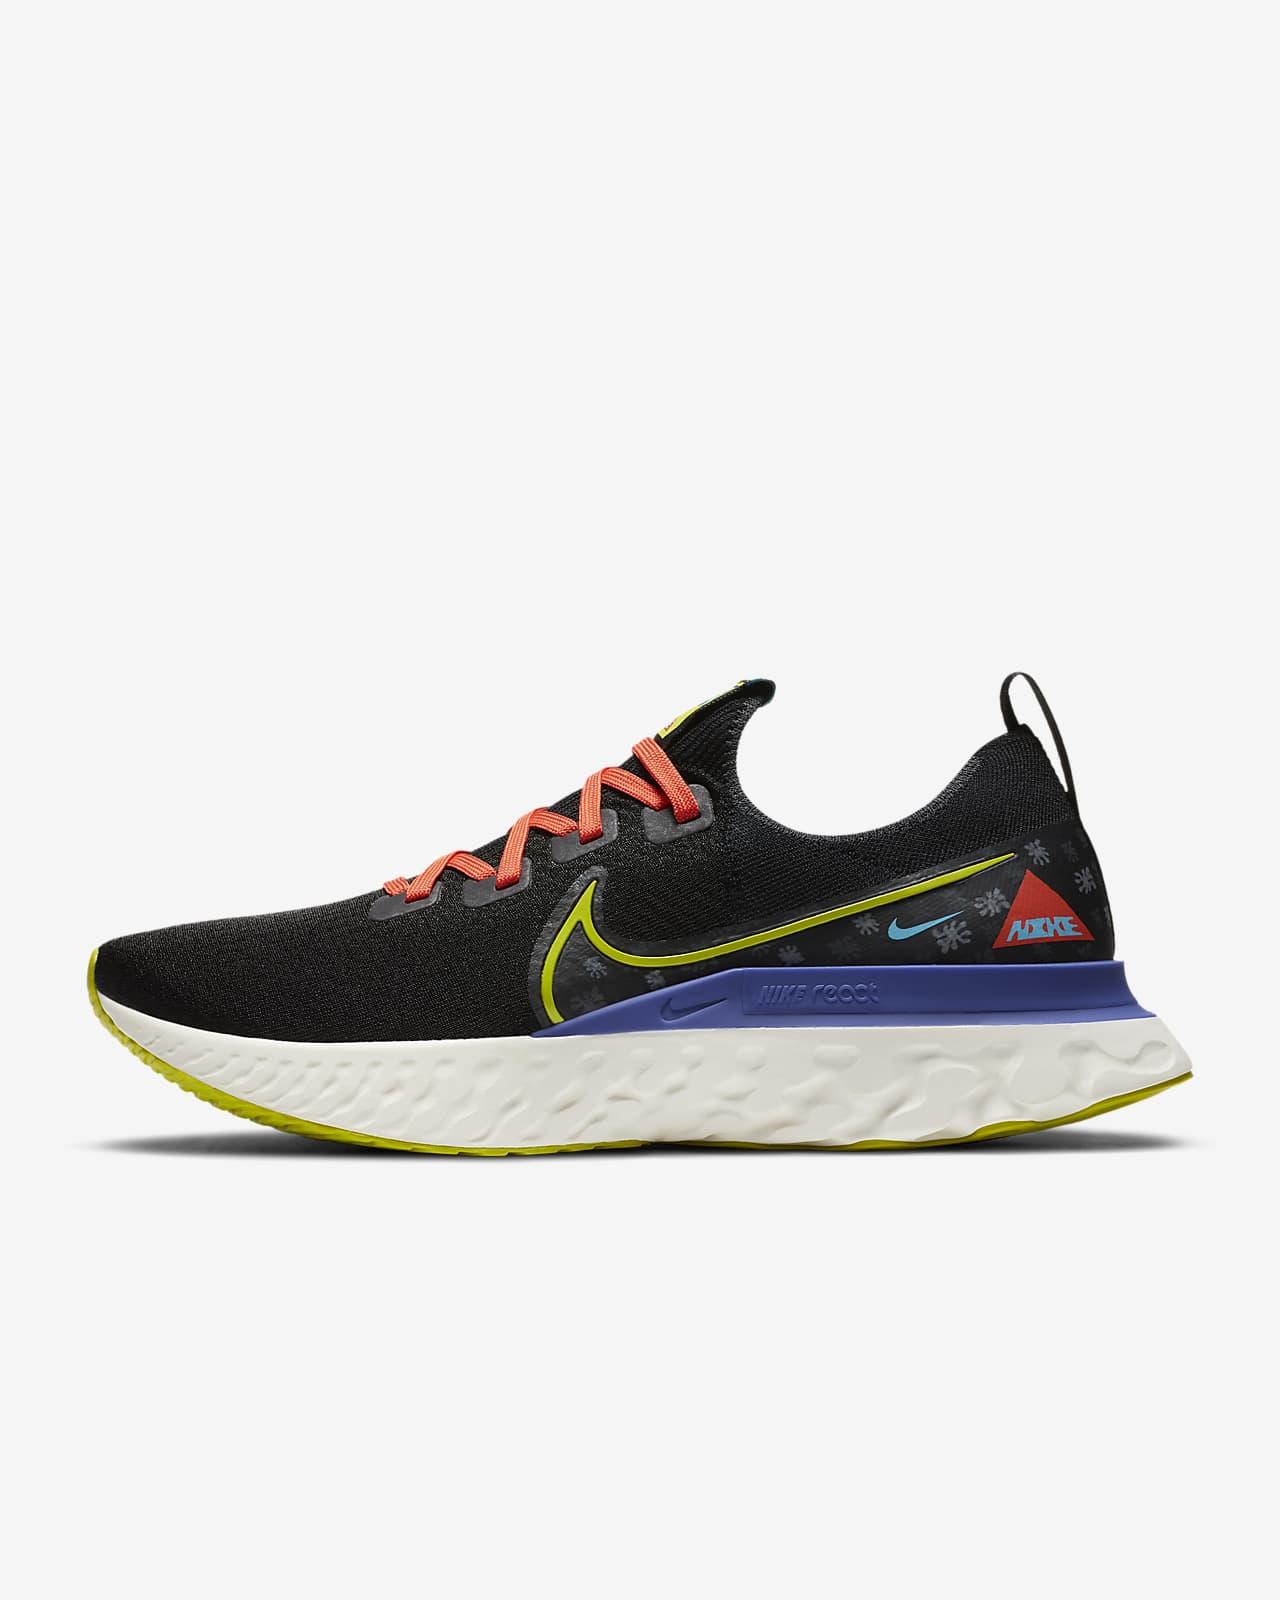 Nike React Infinity Run Flyknit A.I.R. Buty do biegania Chaz Bear